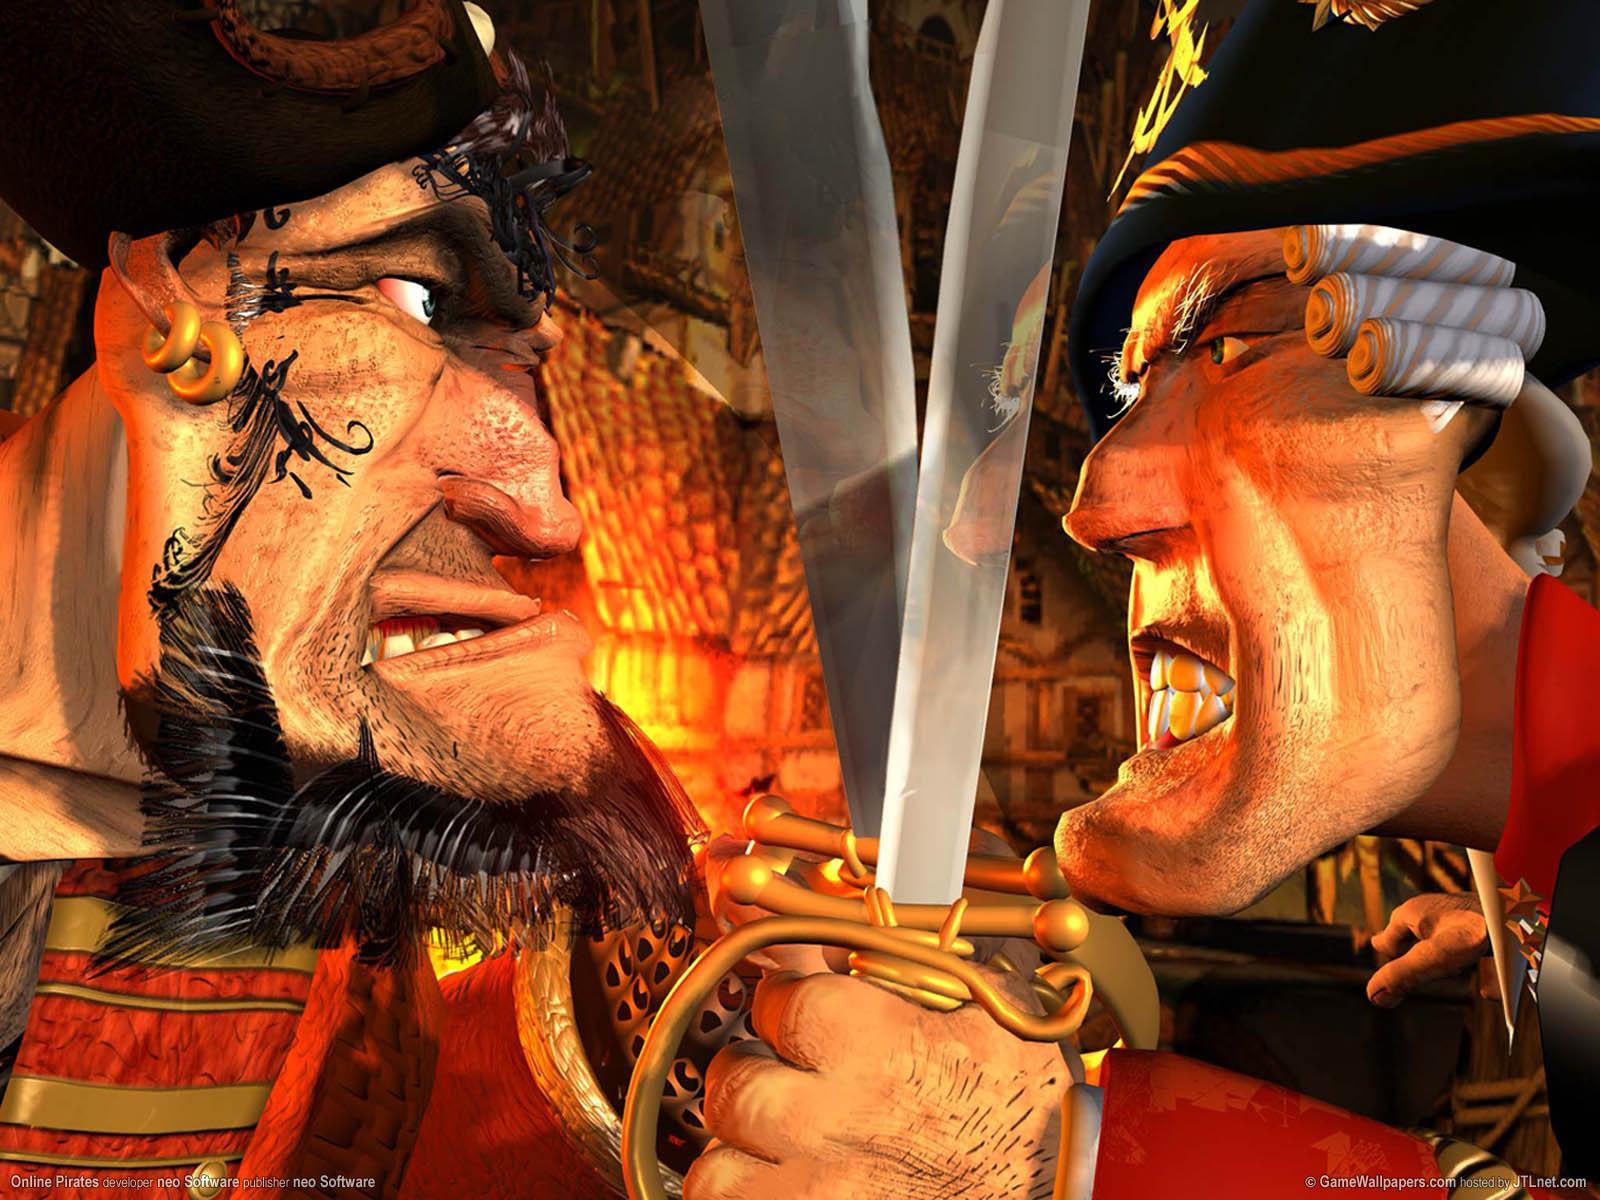 Online Pirates wallpaper 01 1600x1200